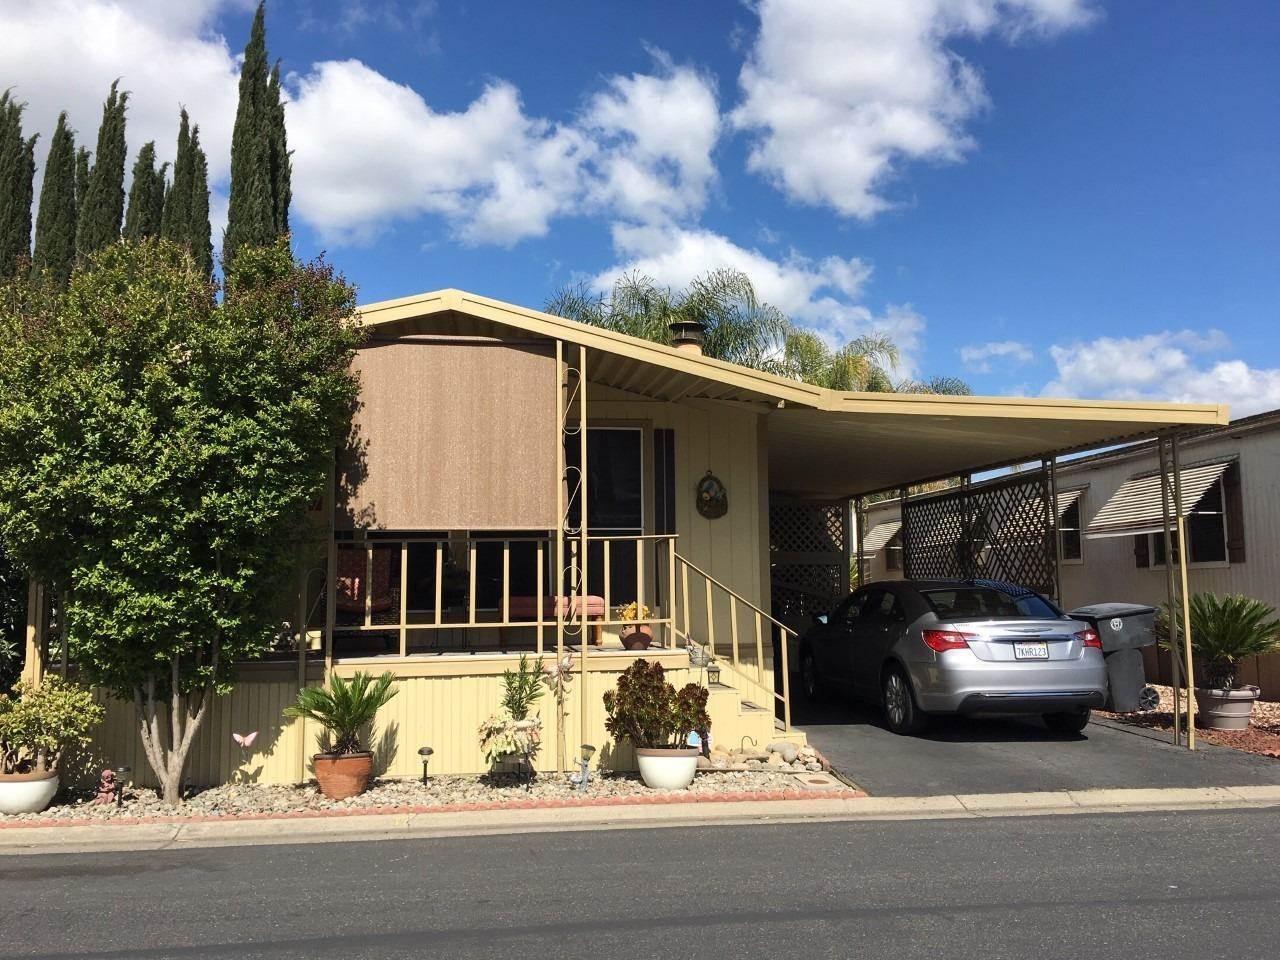 250 East Las Palmas Avenue, Patterson, California